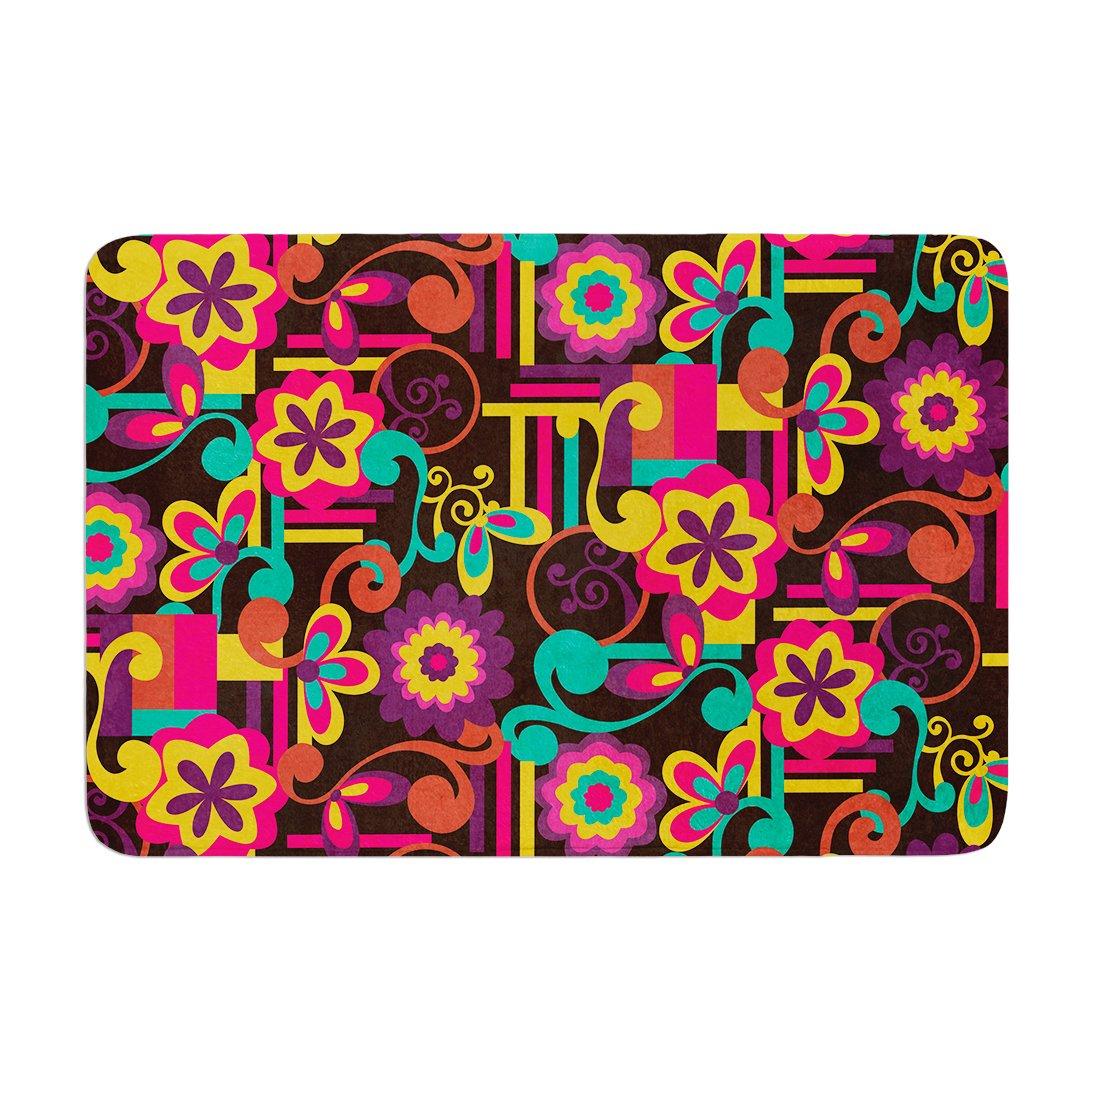 Kess InHouse 'Louise Machado Arabesque Floral Bright Colorful Memory Foam Bath Mat, 17 by 24'